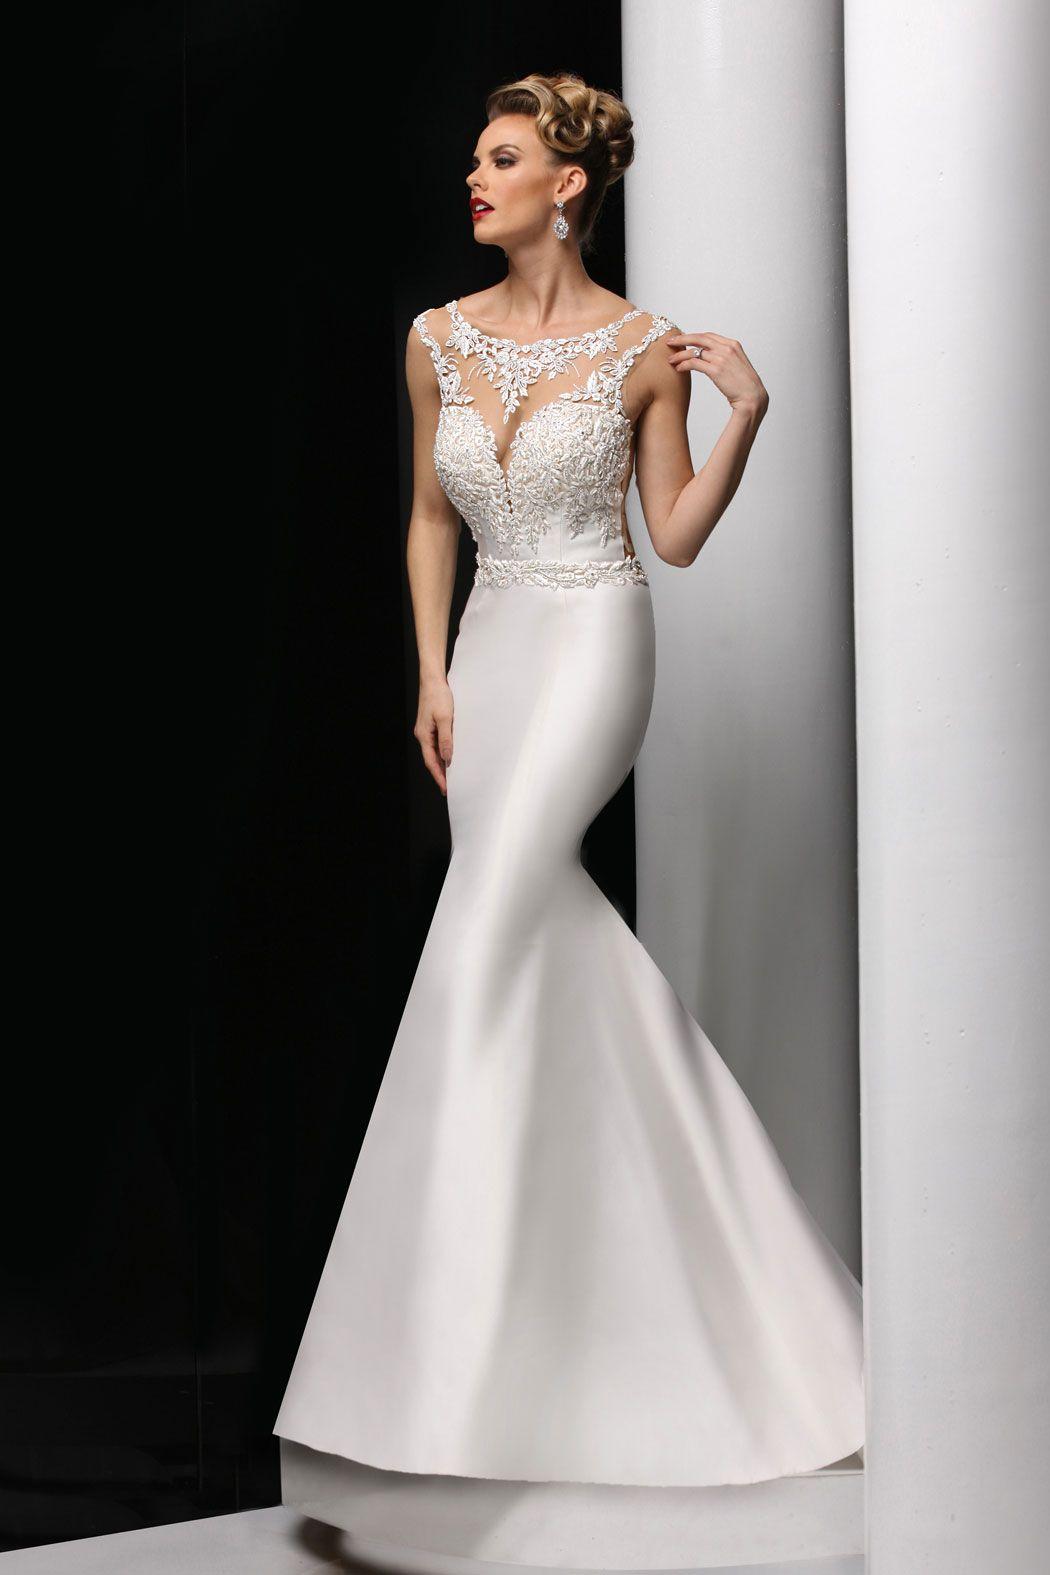 Simone Carvalli Bridal Style 90273A Two piece bridesmaid